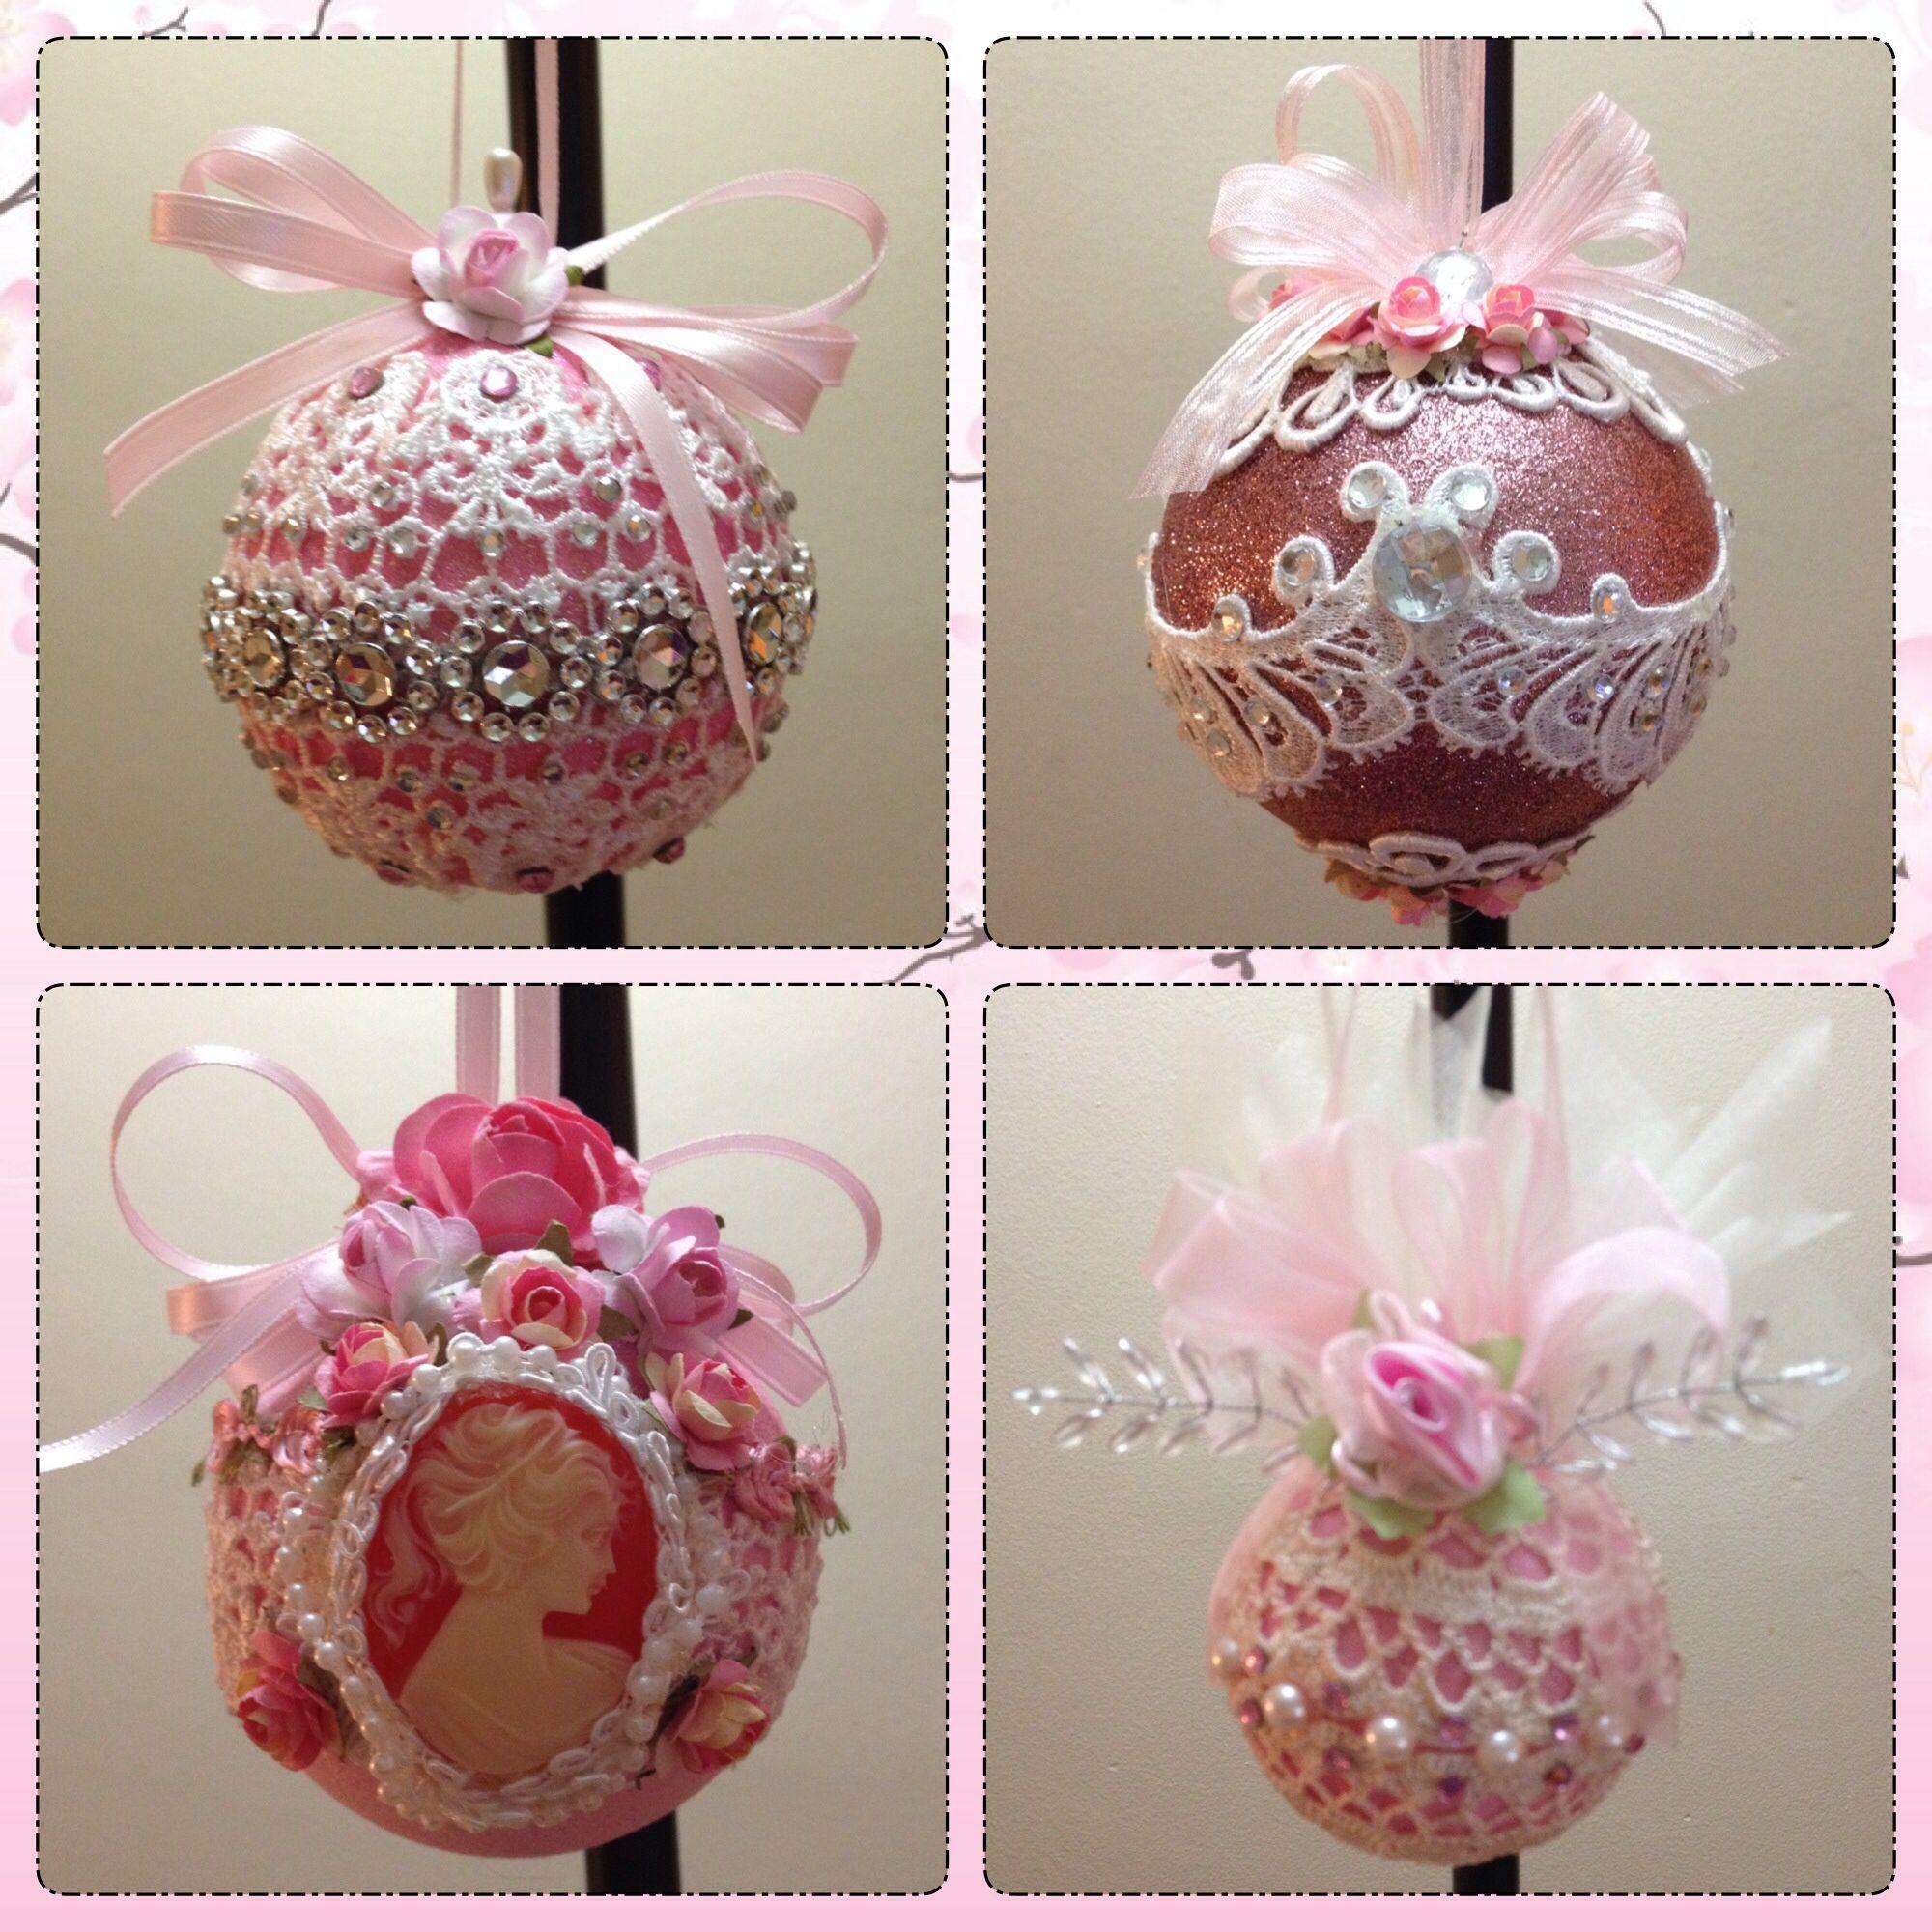 Handmade shabby chic ornaments | Shabby chic decor | Pinterest ...